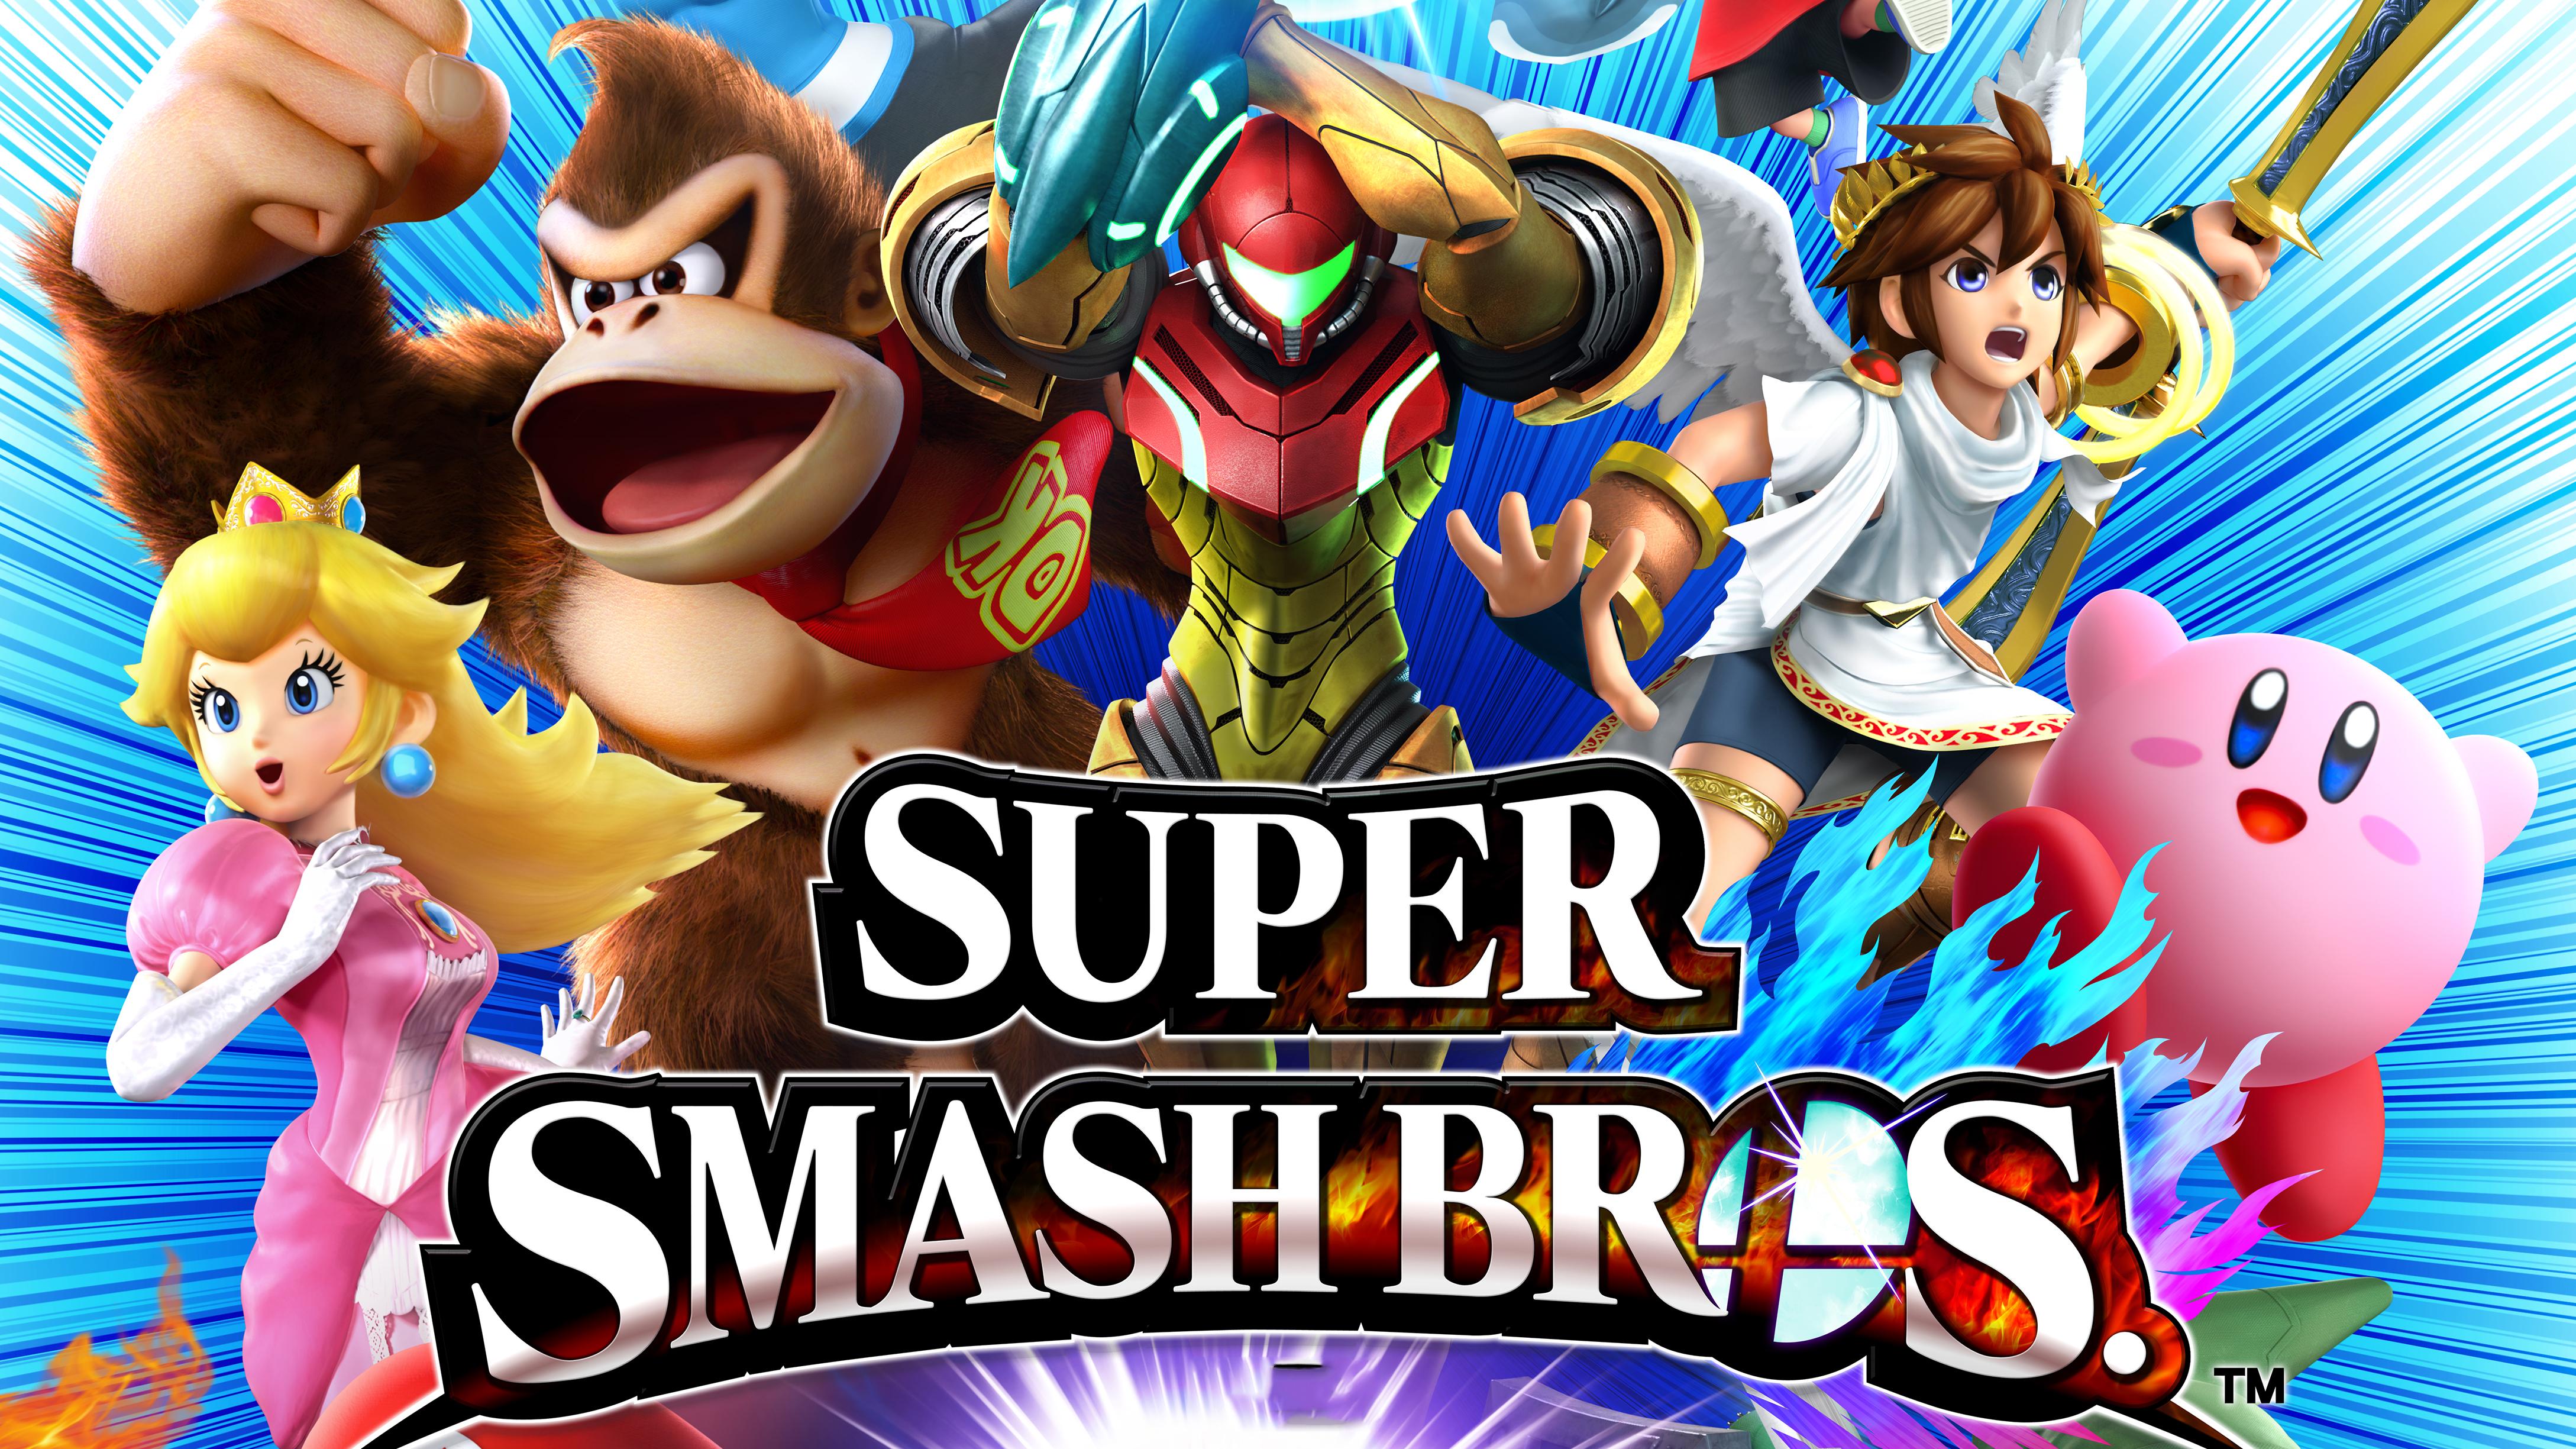 Smash Bros Wii U : Super smash bros for wii u les annonces de nintendo